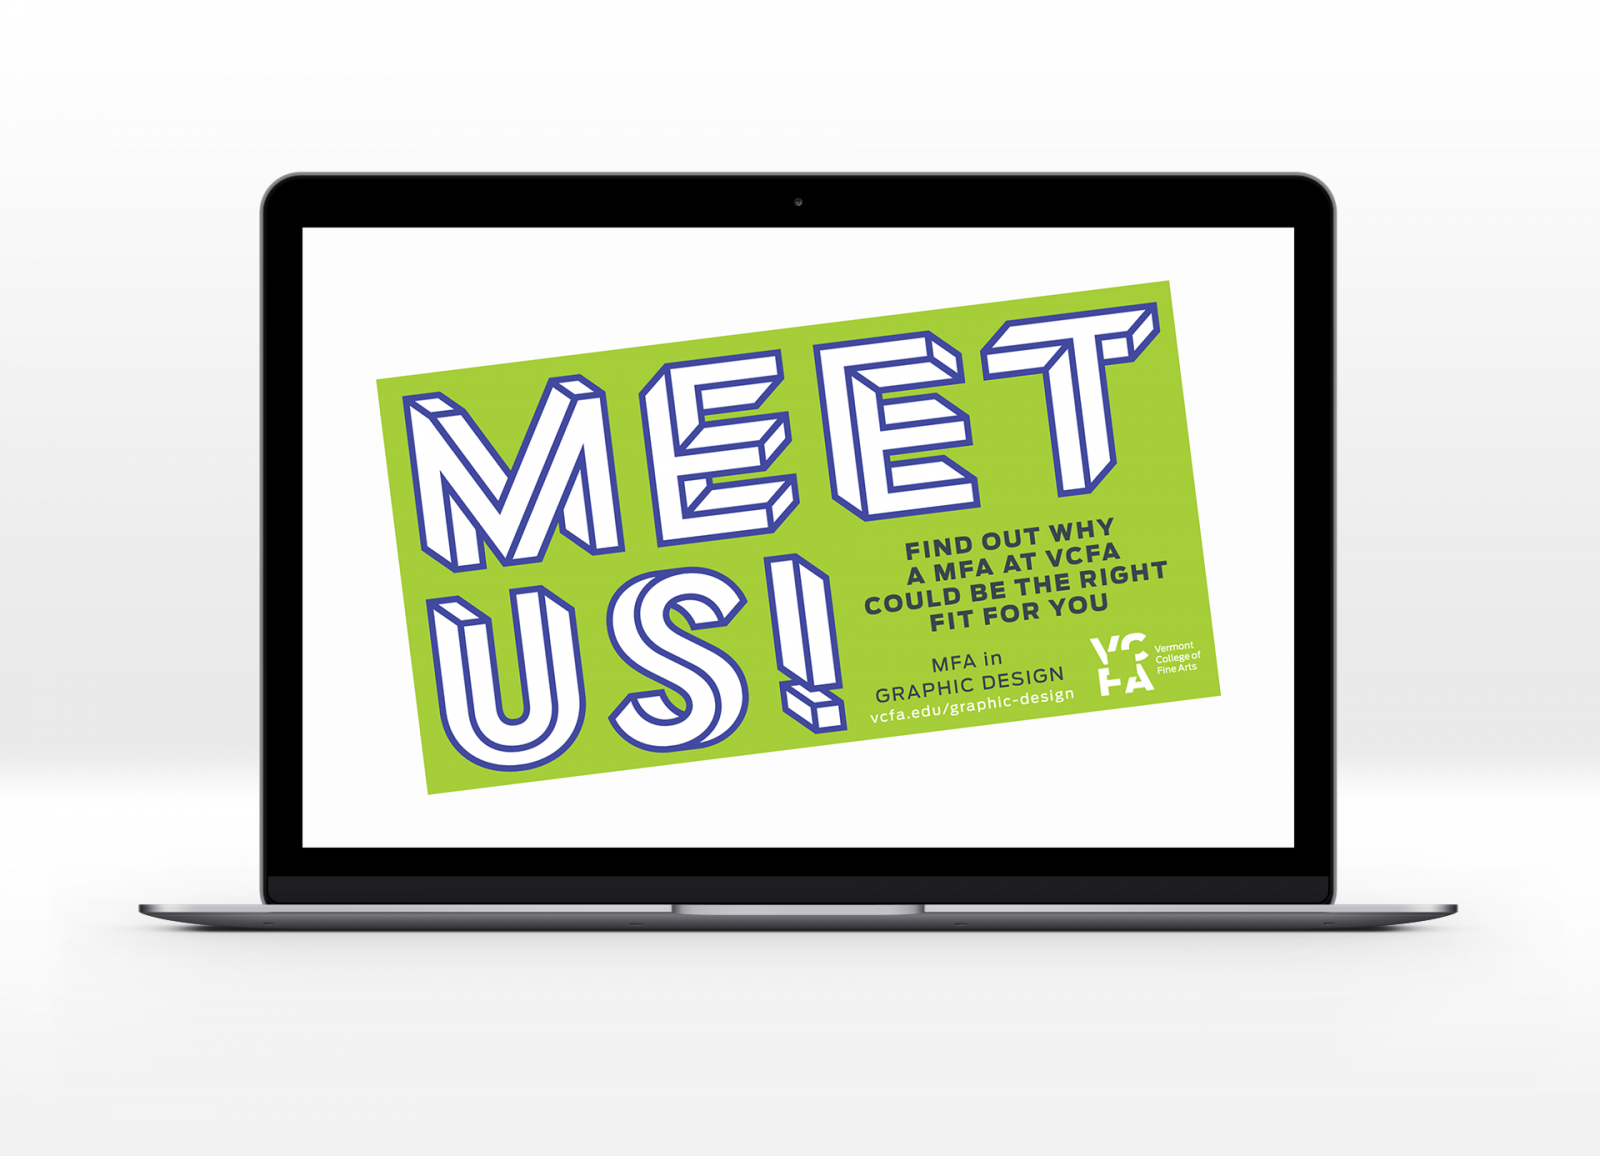 VCFA-web-banners